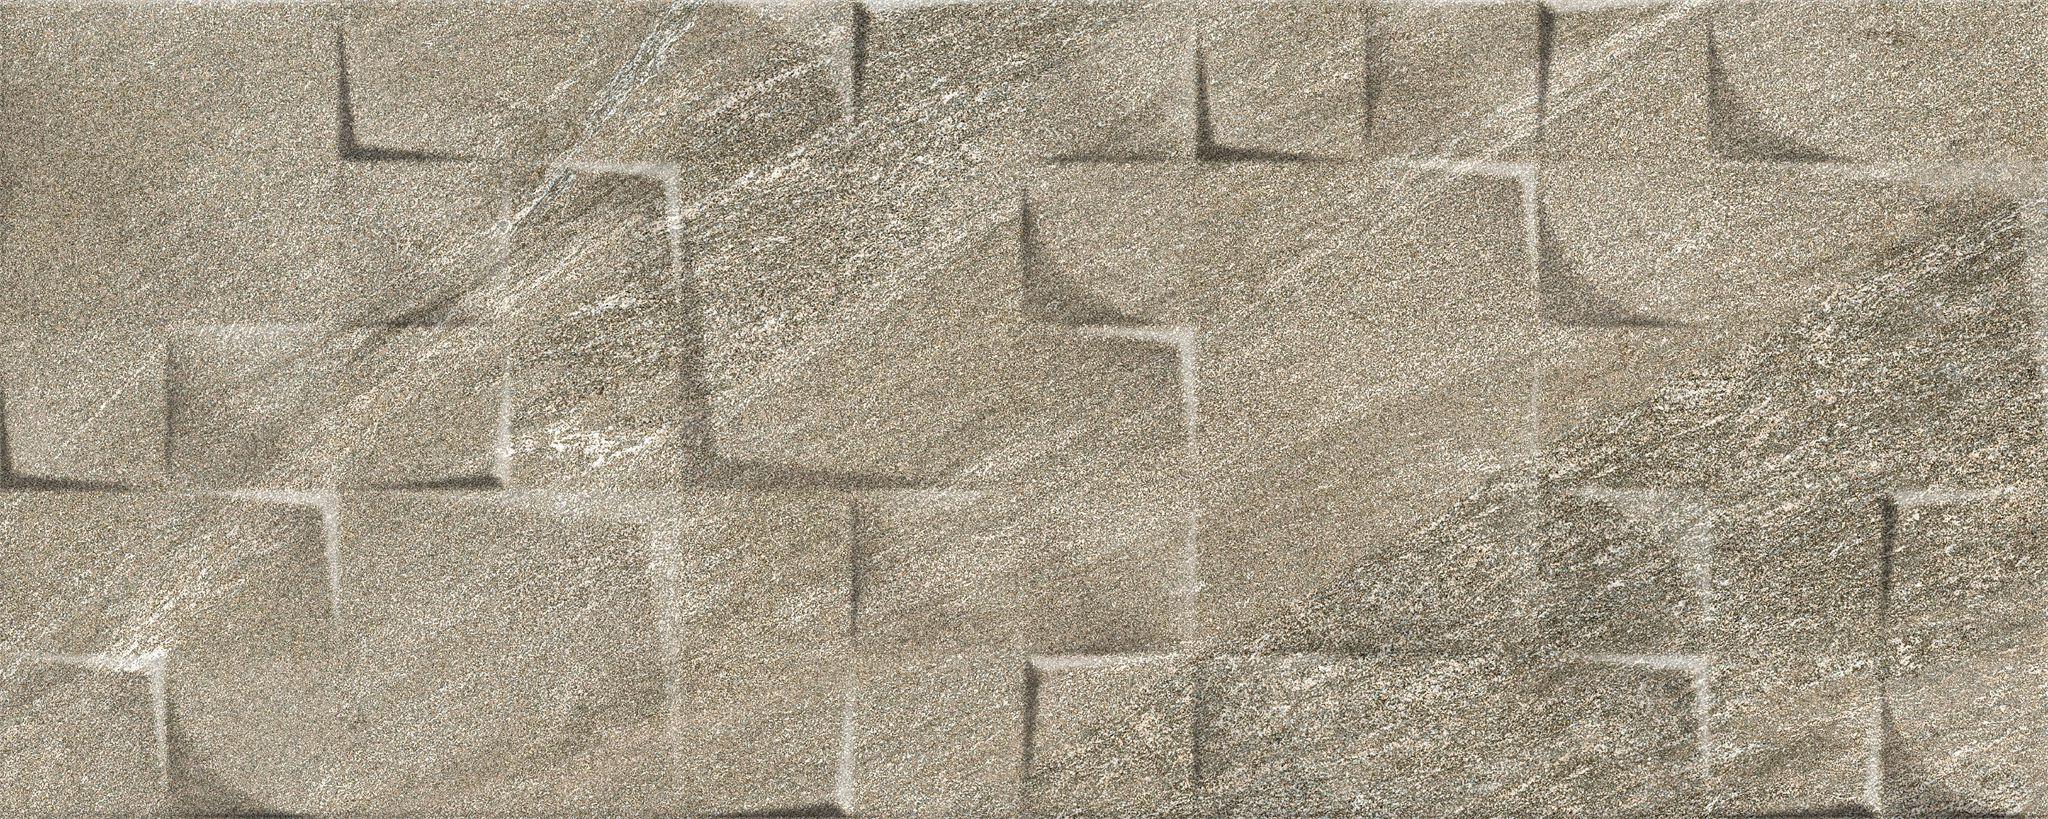 Настенная плитка Mayolica Avalon Nilo Terra 28х70 пылесос lavor nilo